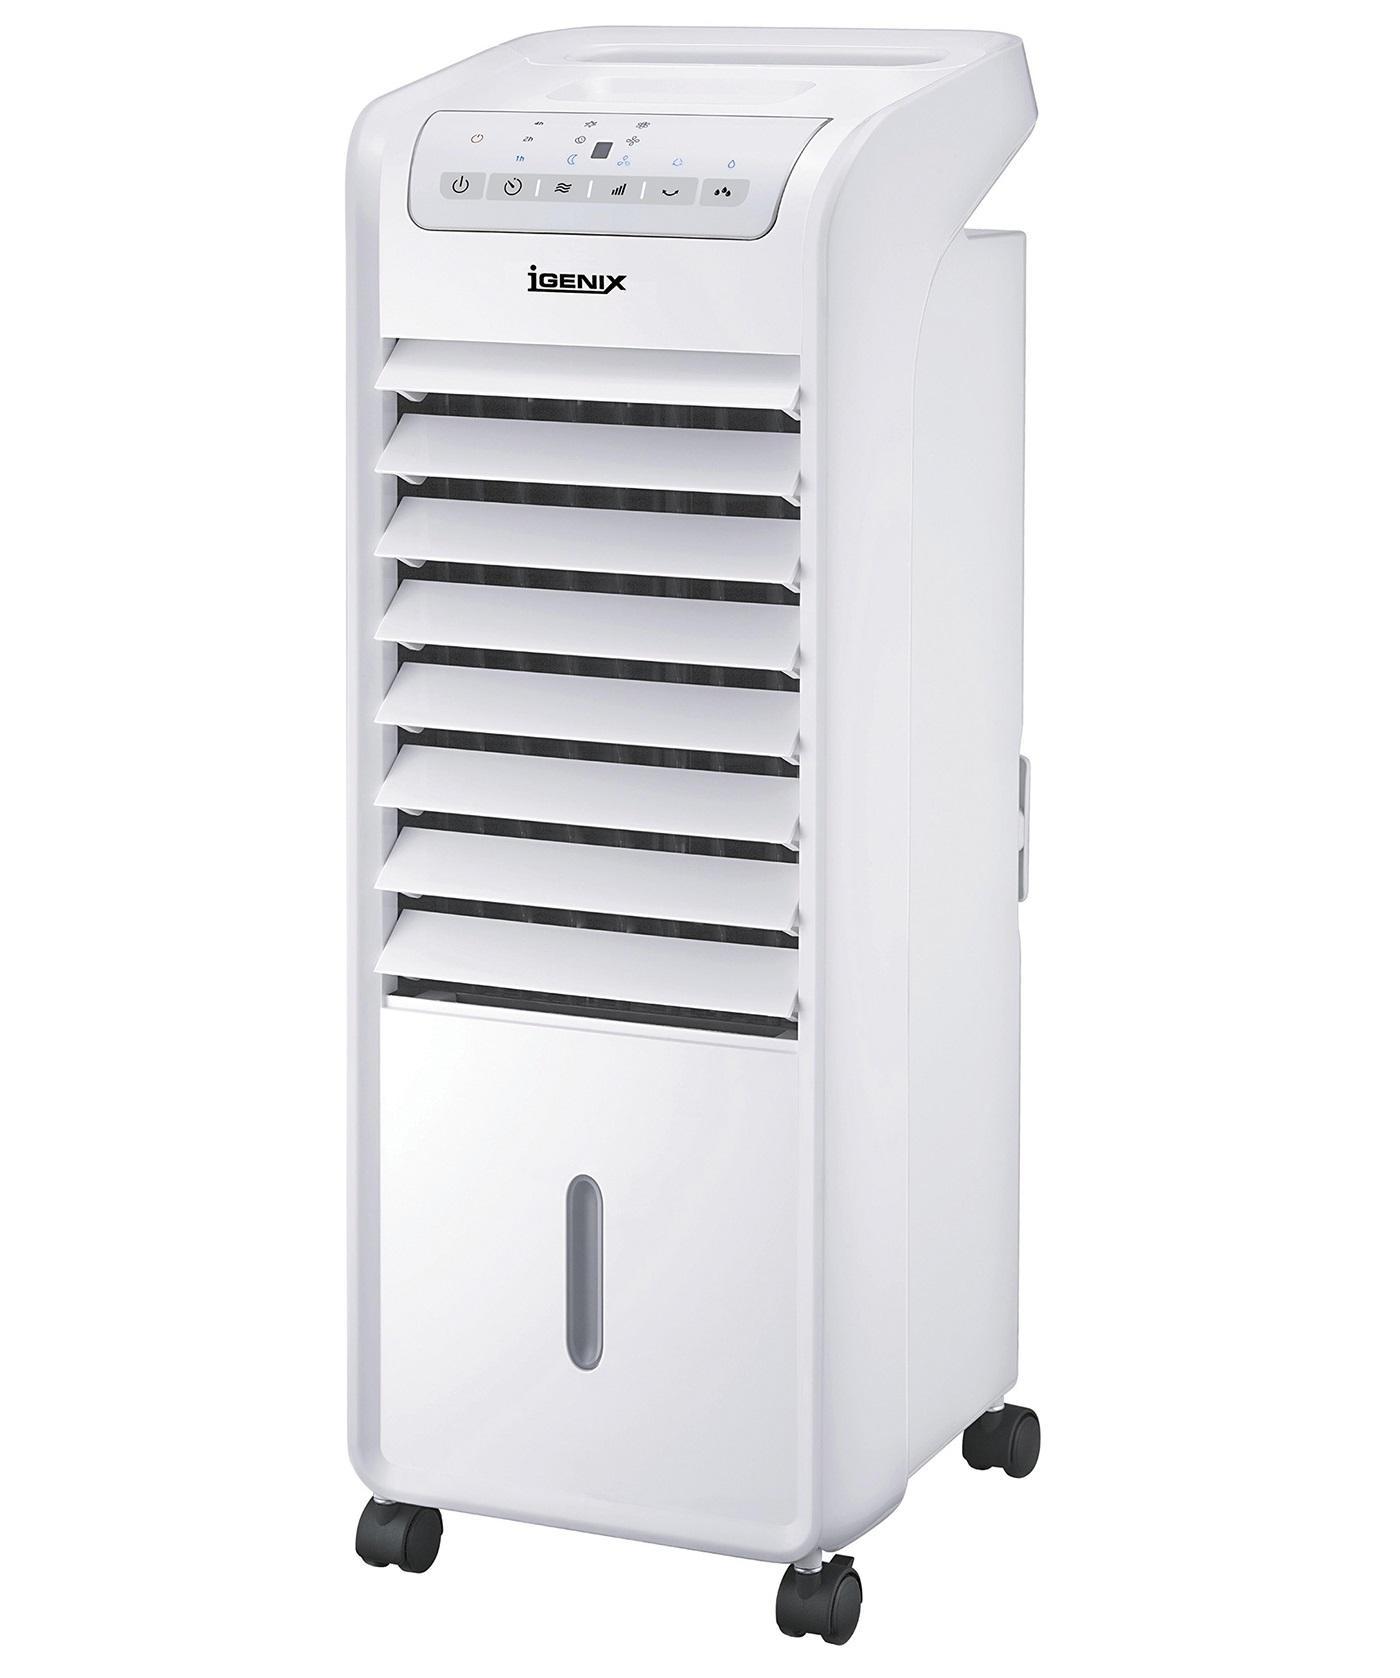 igenix ig9703 air cooler with led display 55 w white. Black Bedroom Furniture Sets. Home Design Ideas